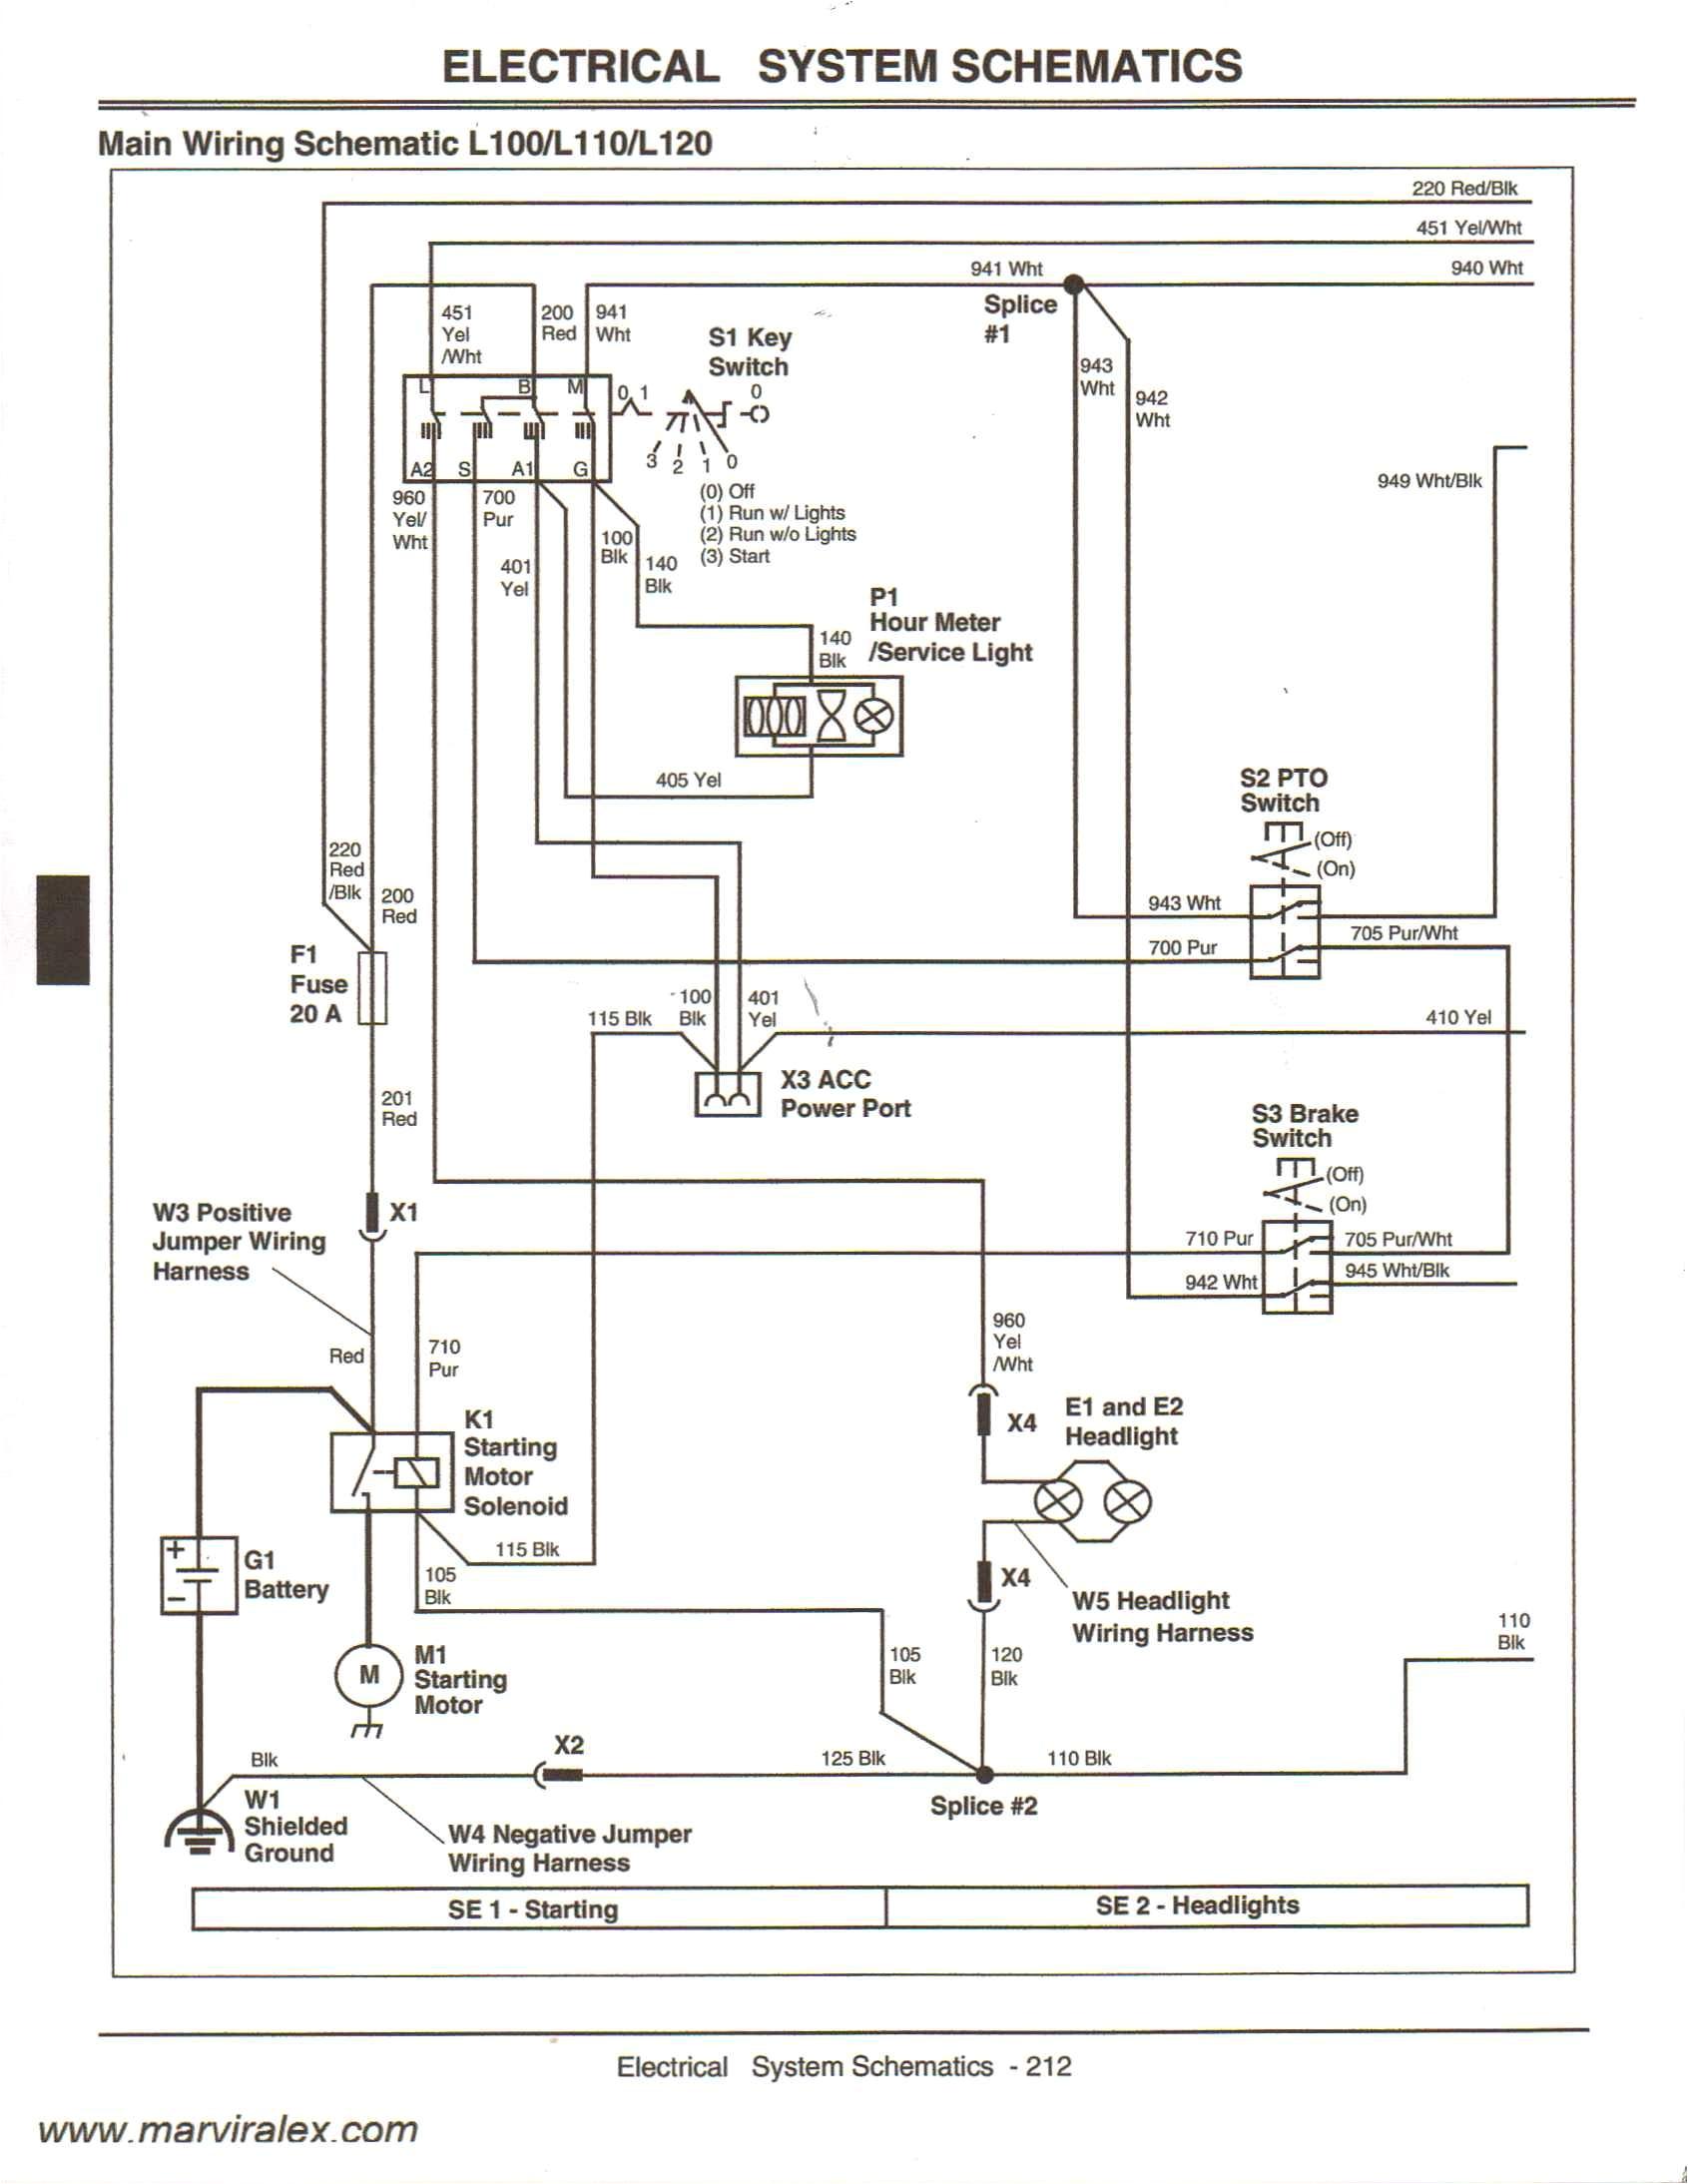 john deere lt160 wiring diagram john deere g100 wiring diagram automotive wiring diagrams of john deere